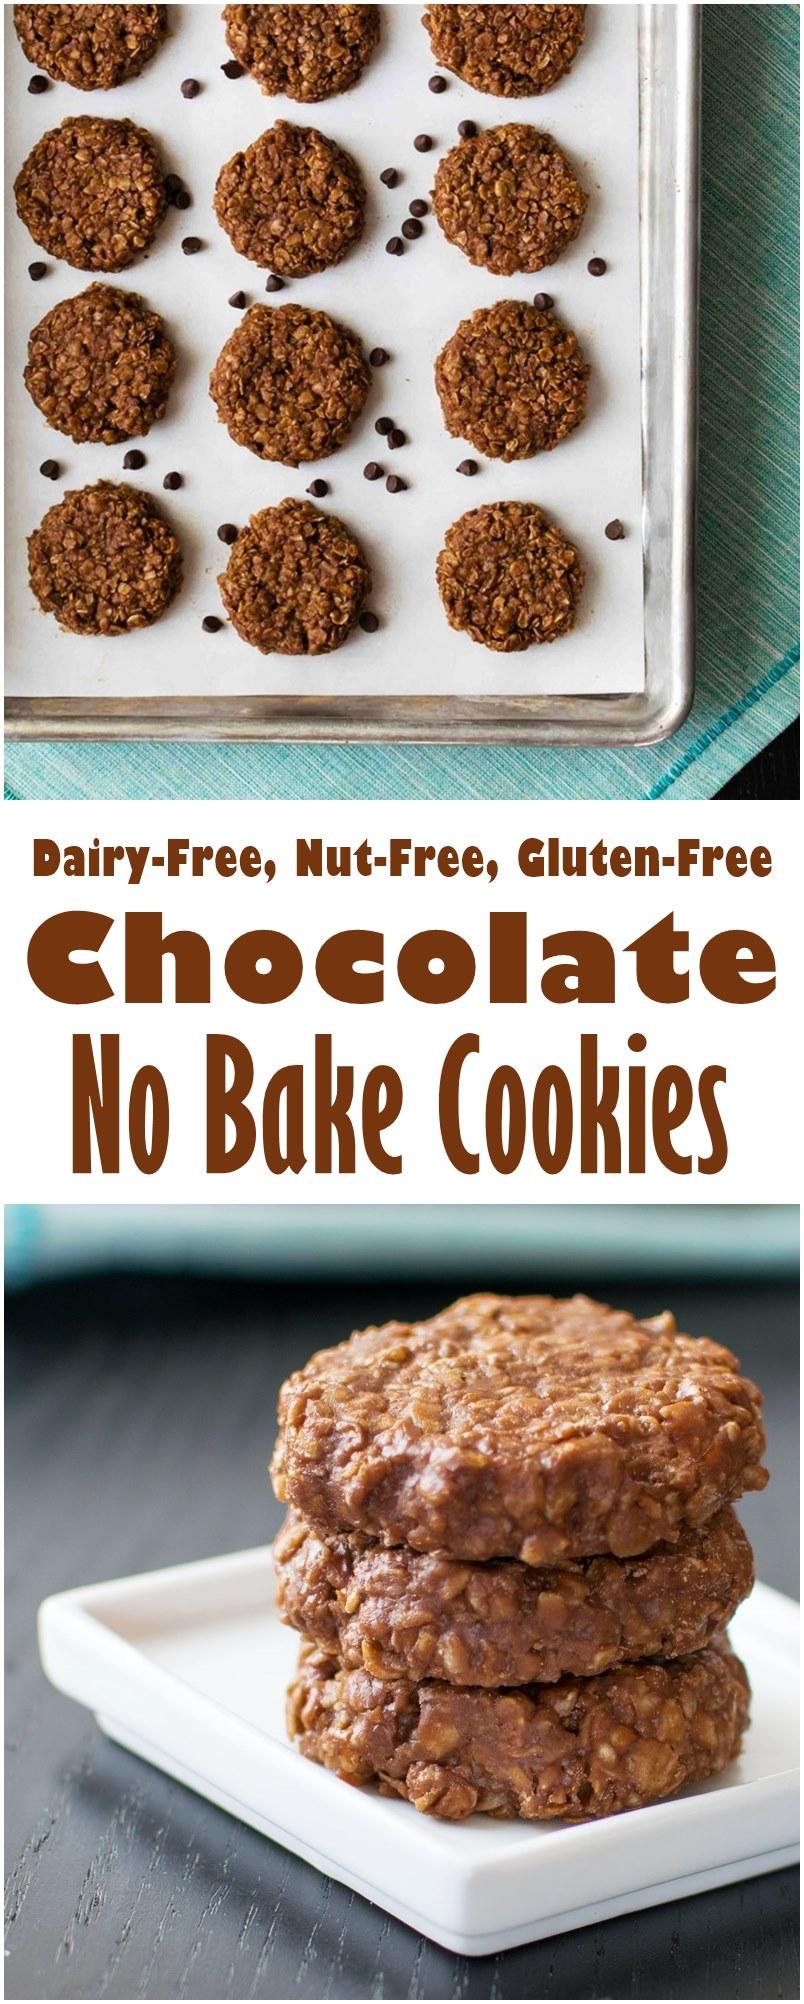 Chocolate No Bake Cookies Recipe (Dairy-Free, Nut-Free, Gluten-Free, Soy-Free, Vegan-Friendly!)